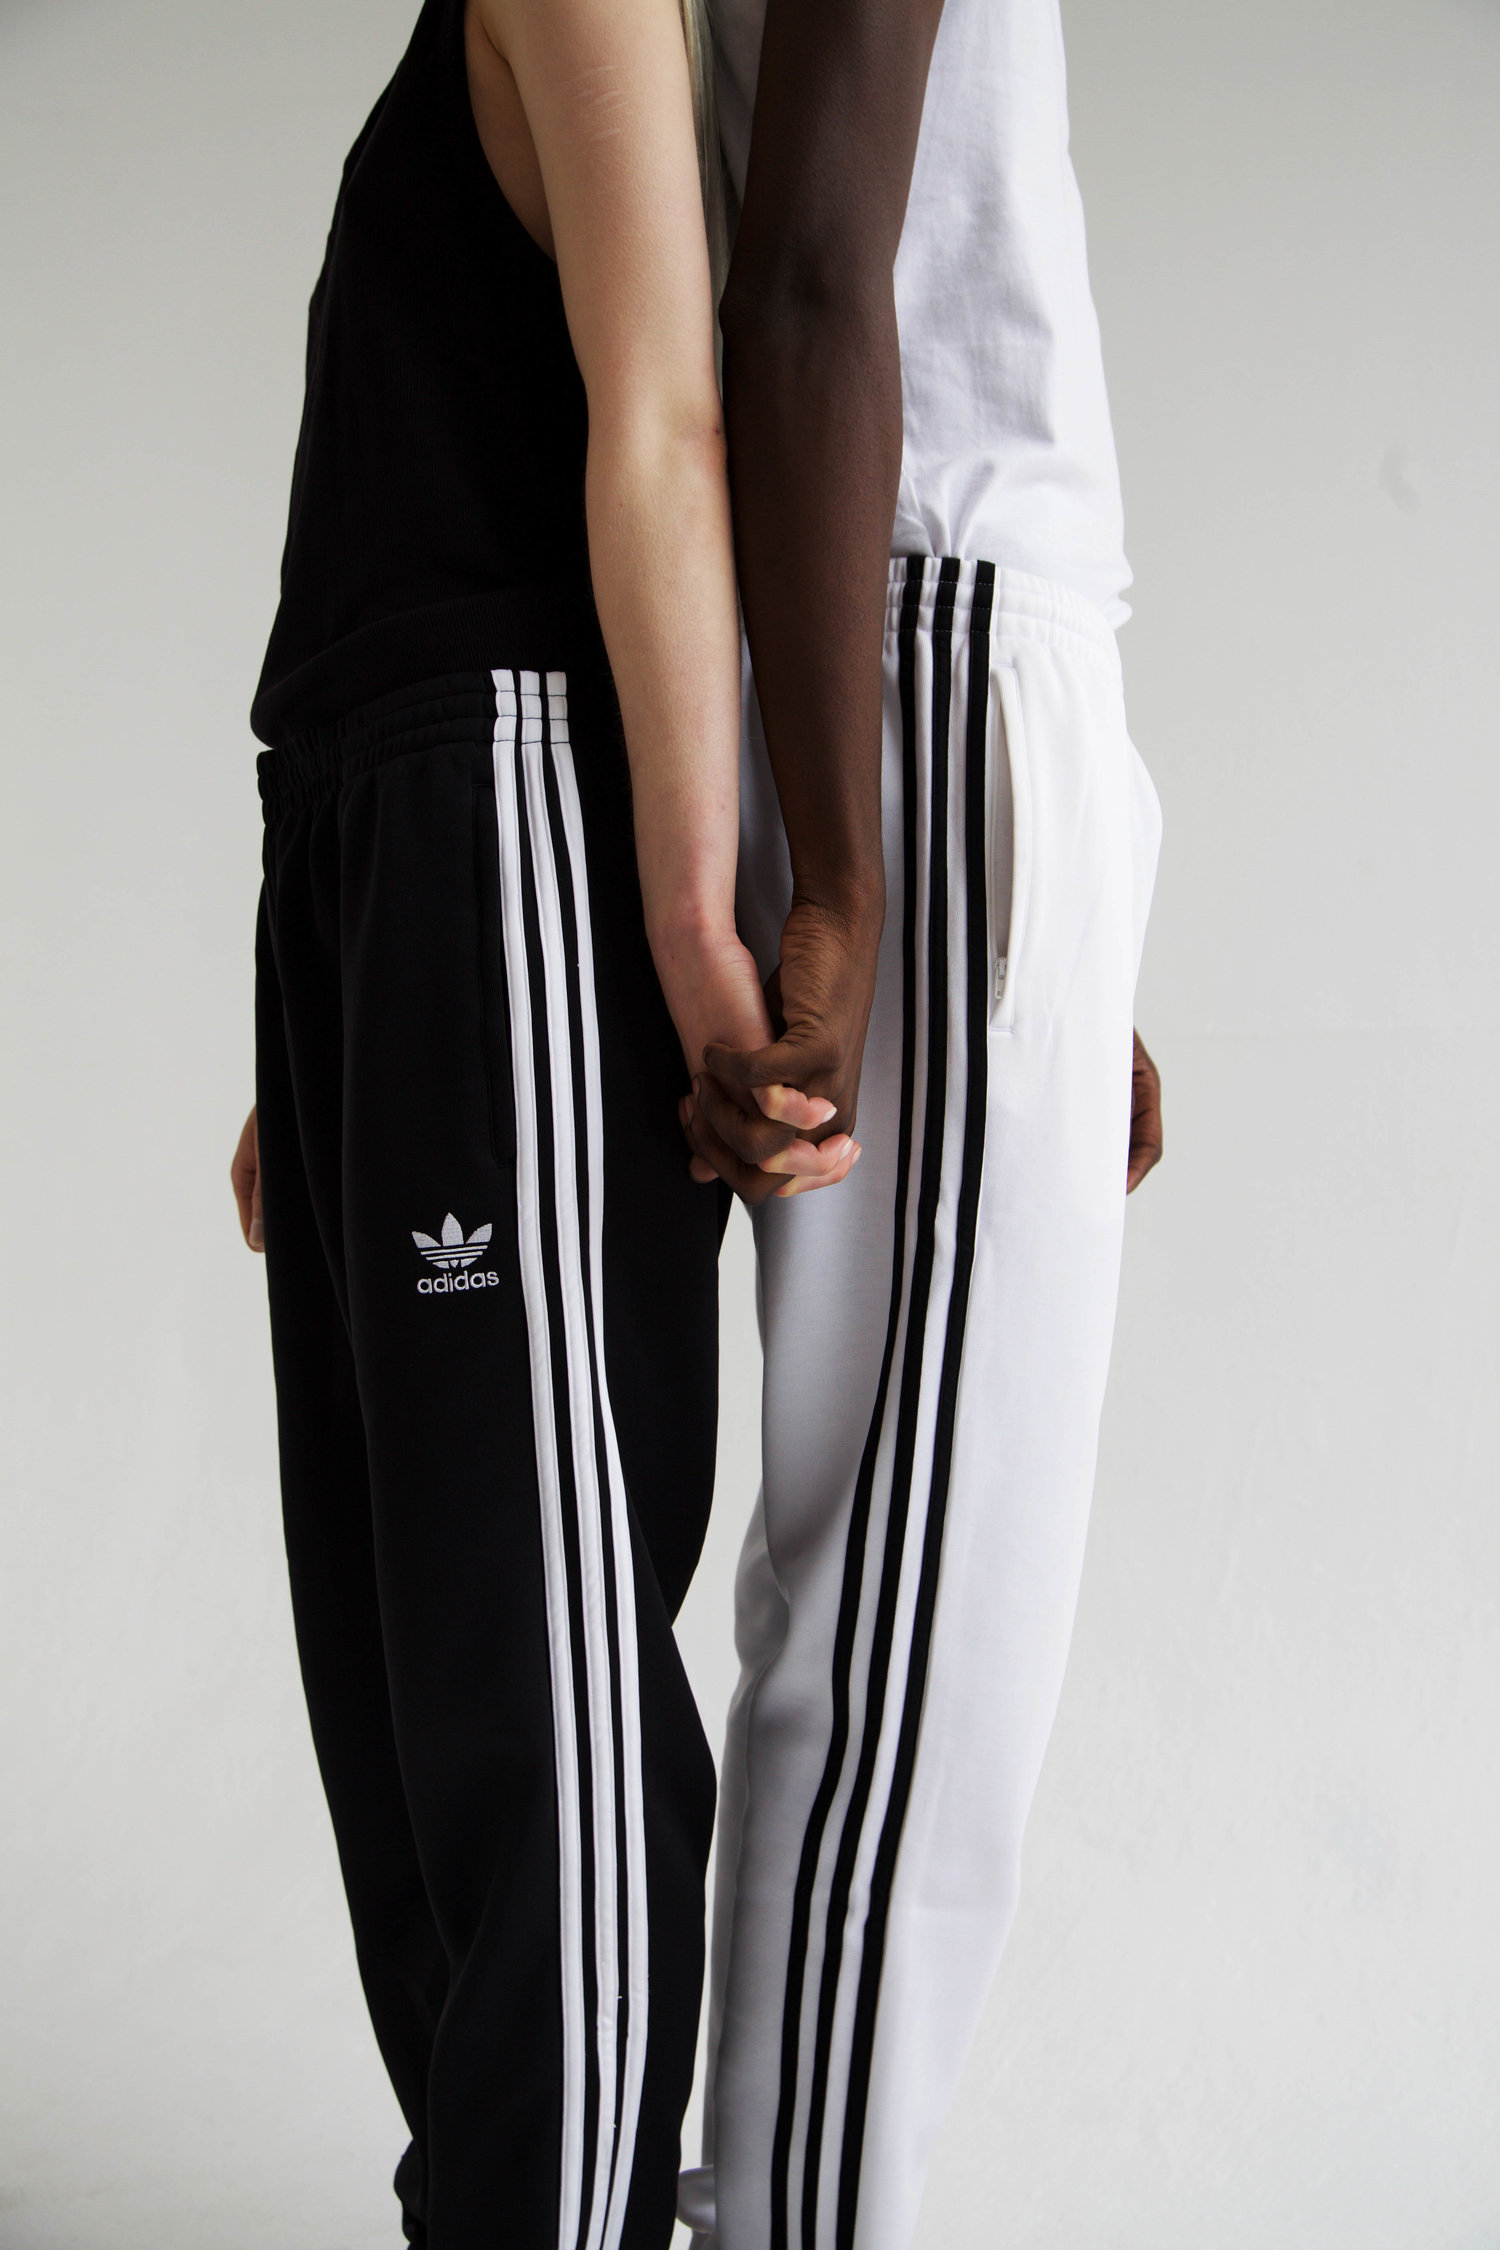 Adidas, London.